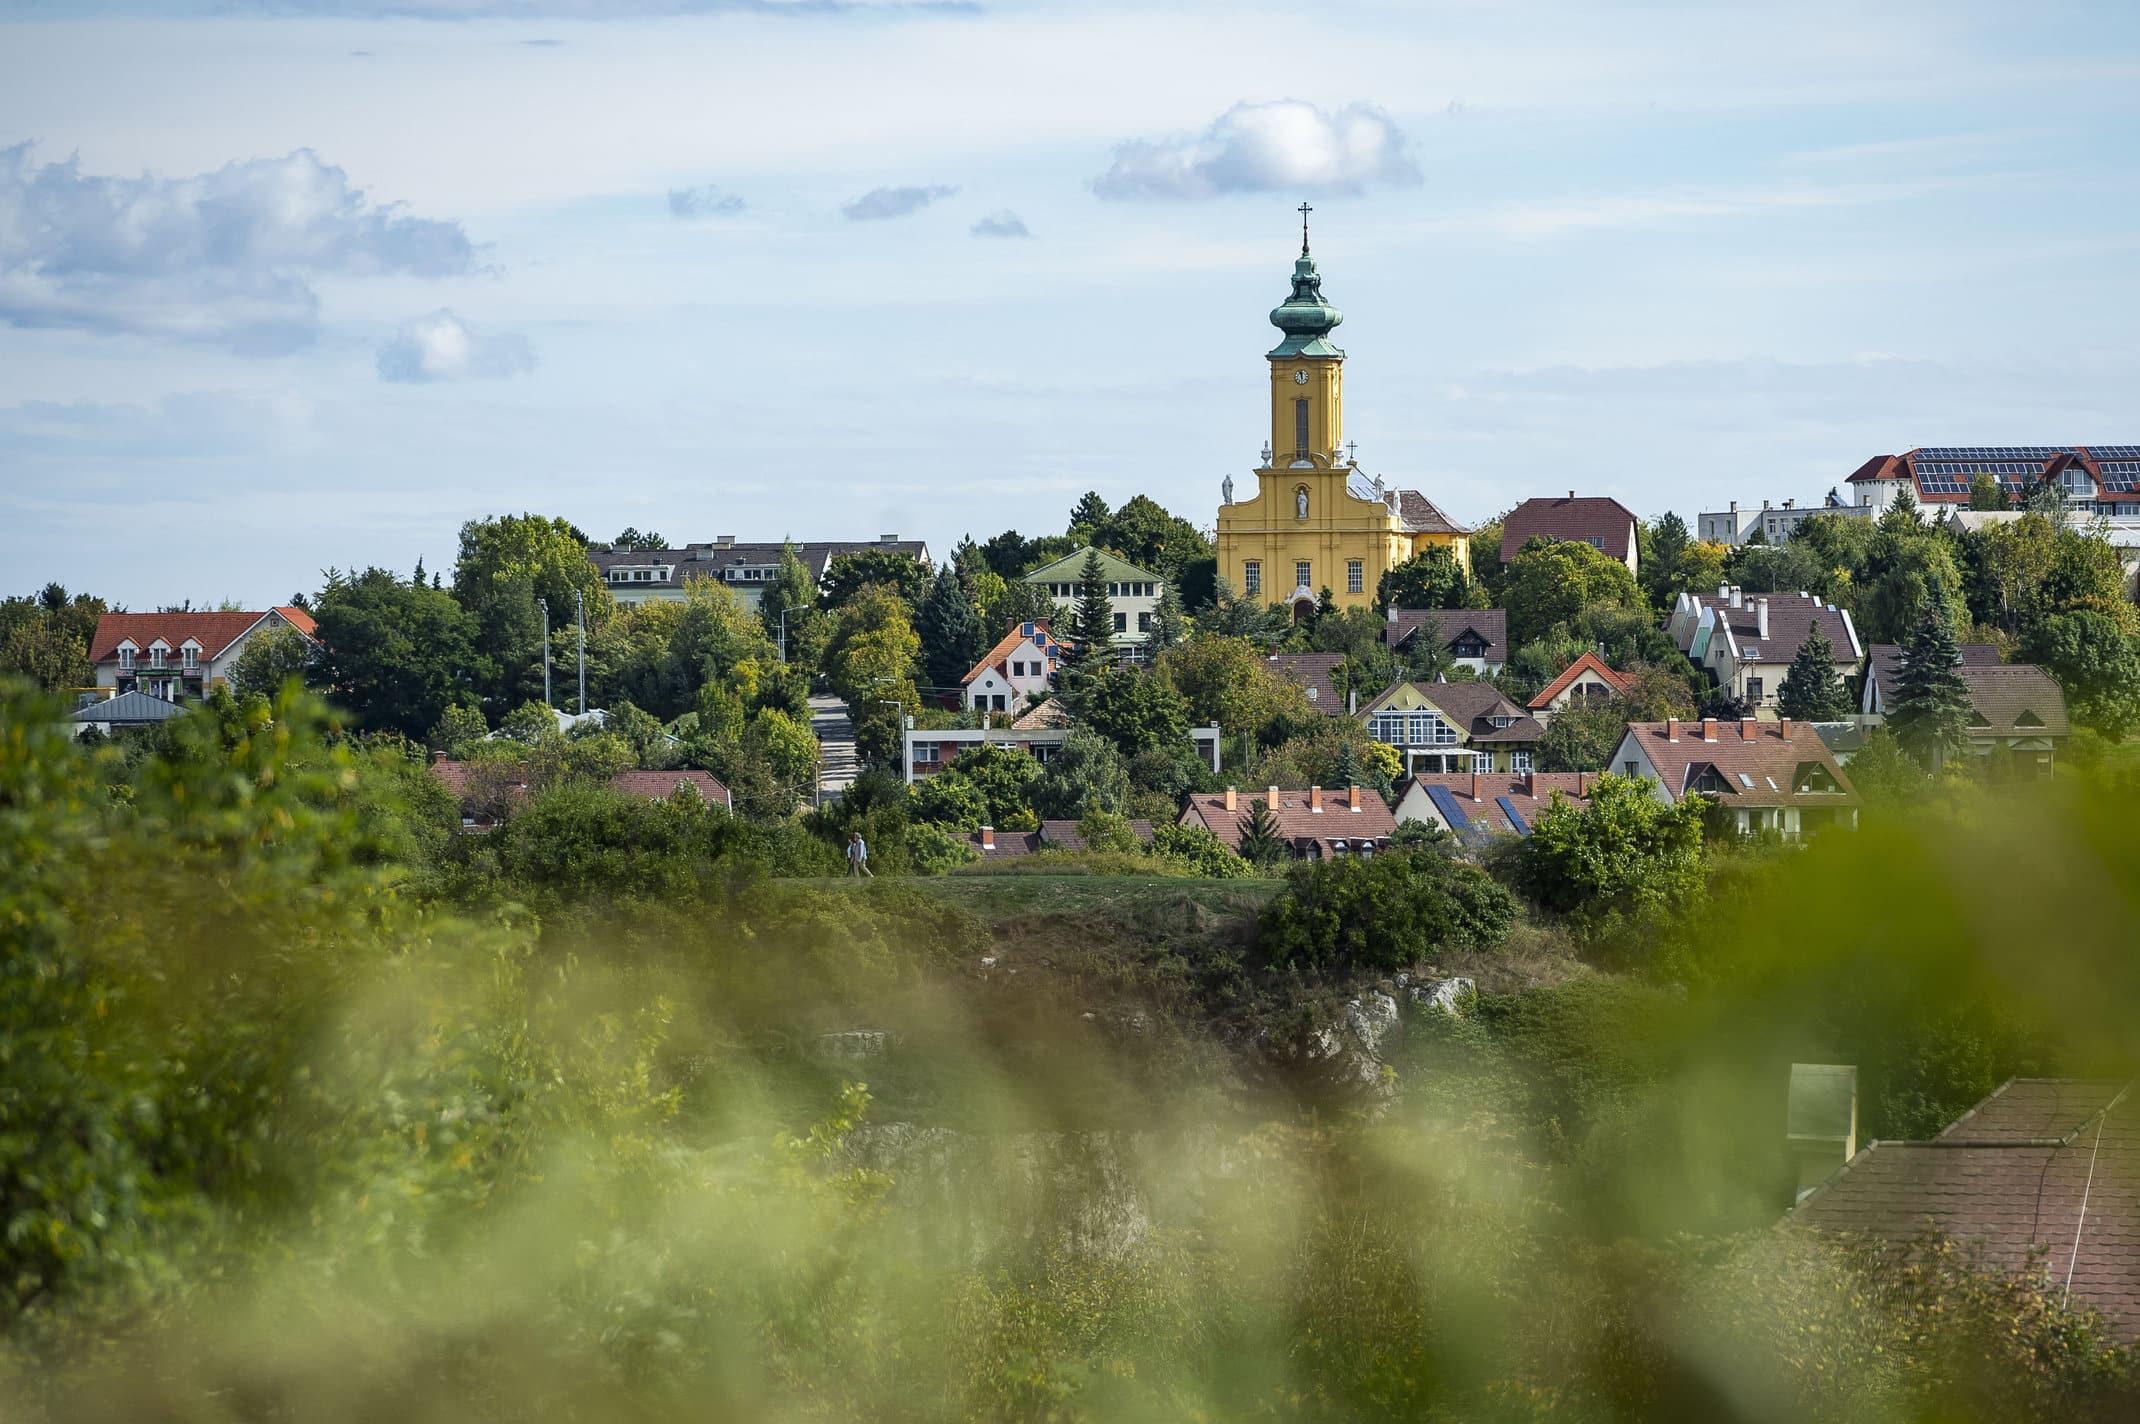 veszprém european capital of culture